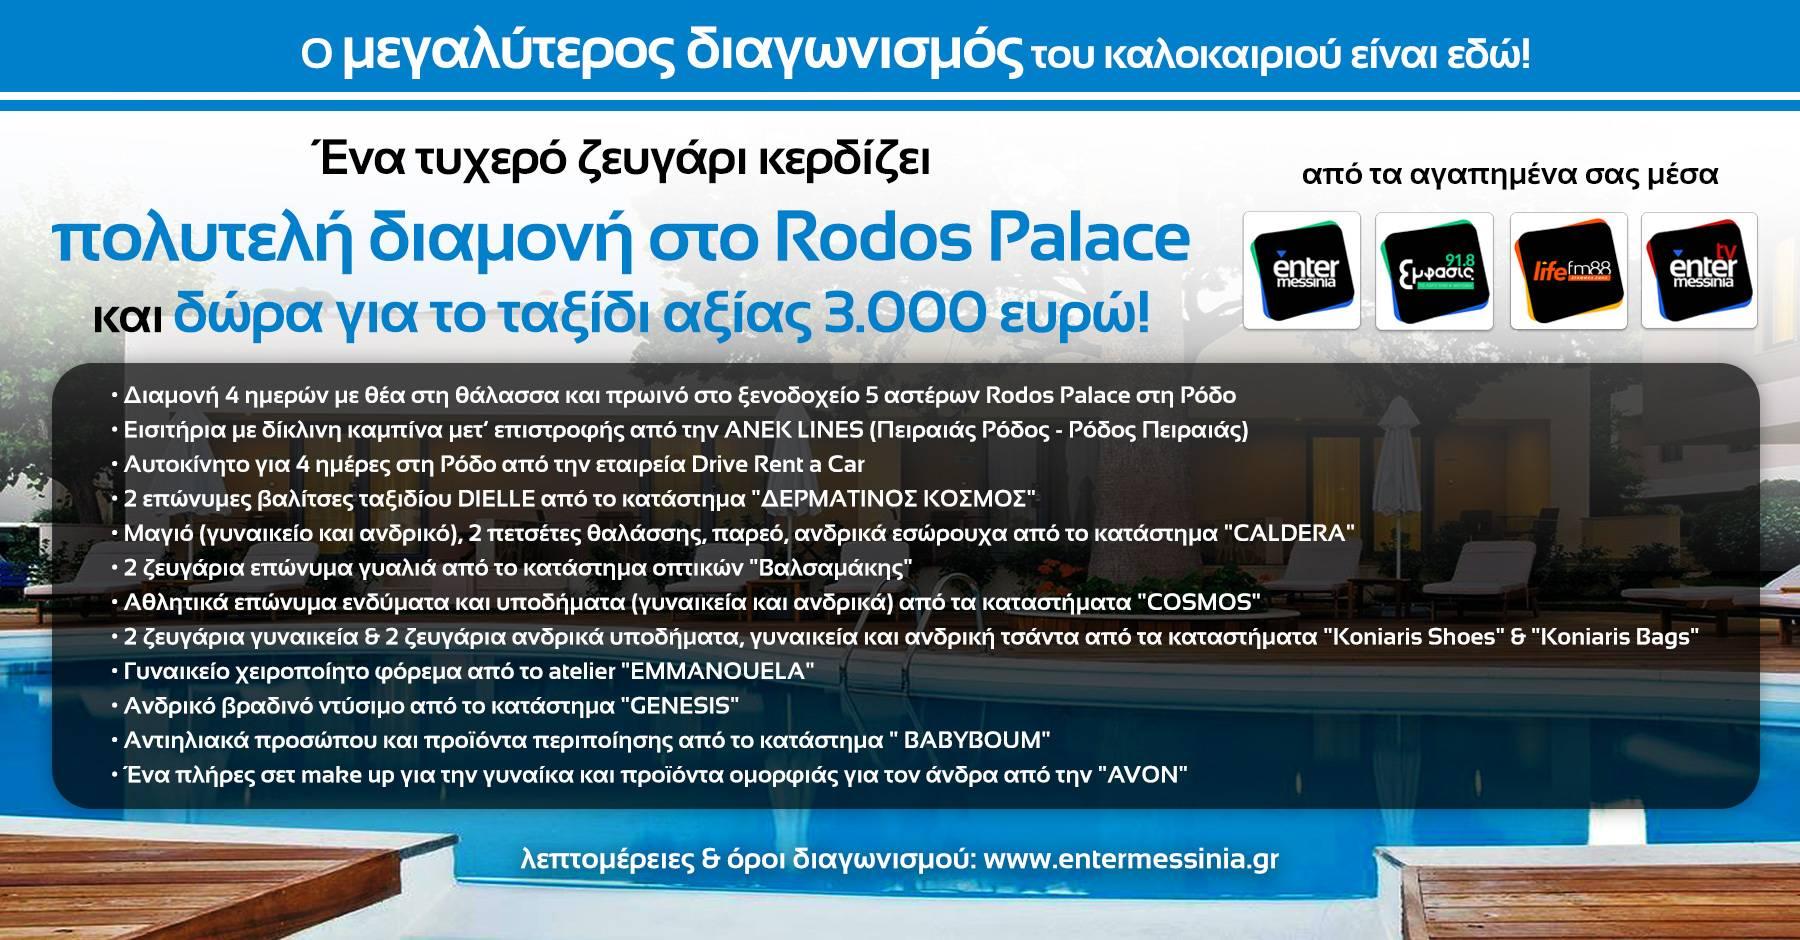 ef6ab58d94 Ο μεγαλύτερος καλοκαιρινός διαγωνισμός με δώρα αξίας 3.000 ευρώ από ...